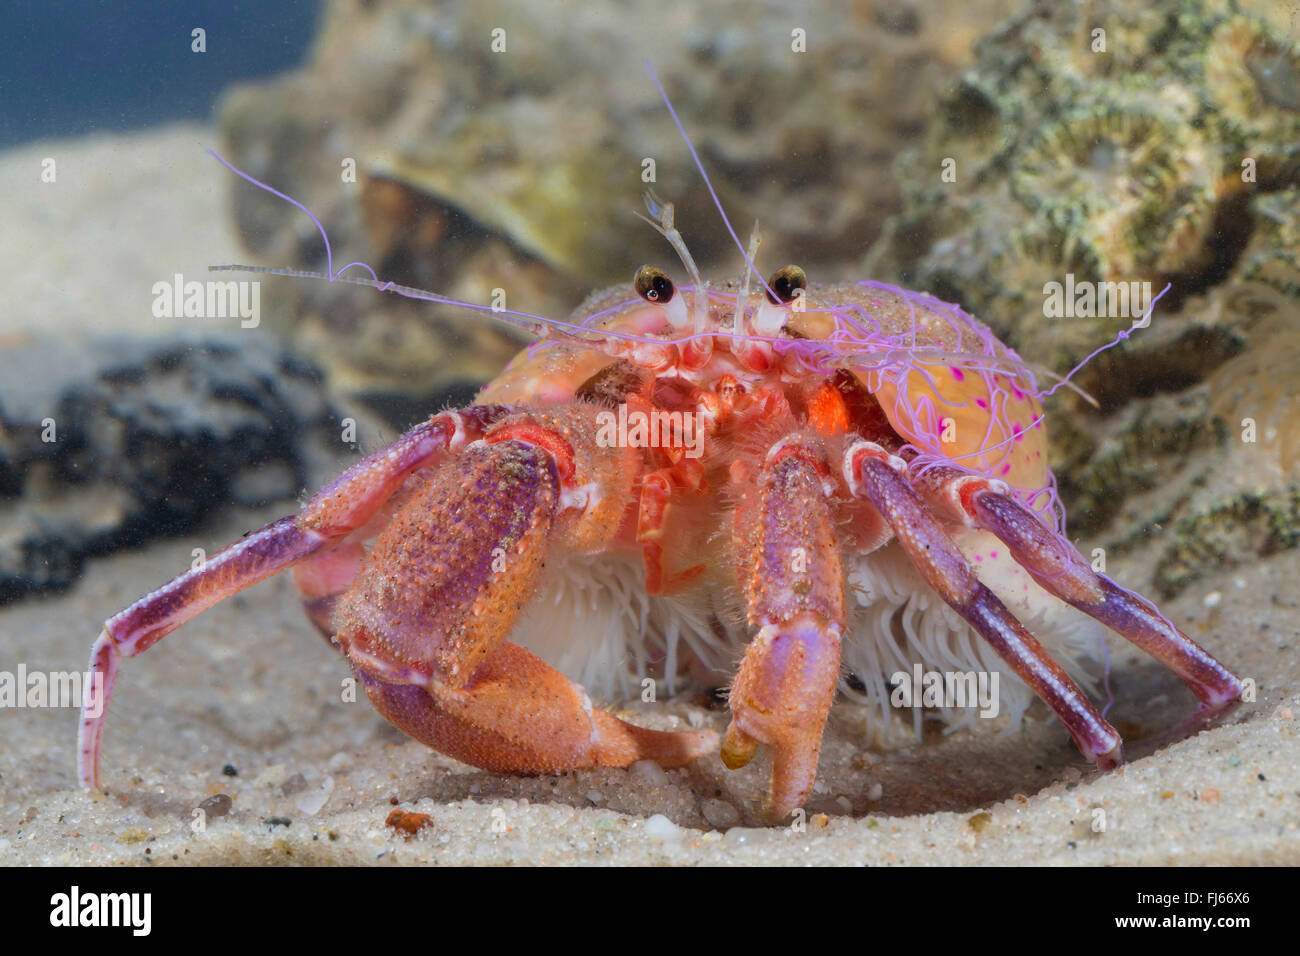 Crab Stock Photos & Crab Stock Images - Alamy